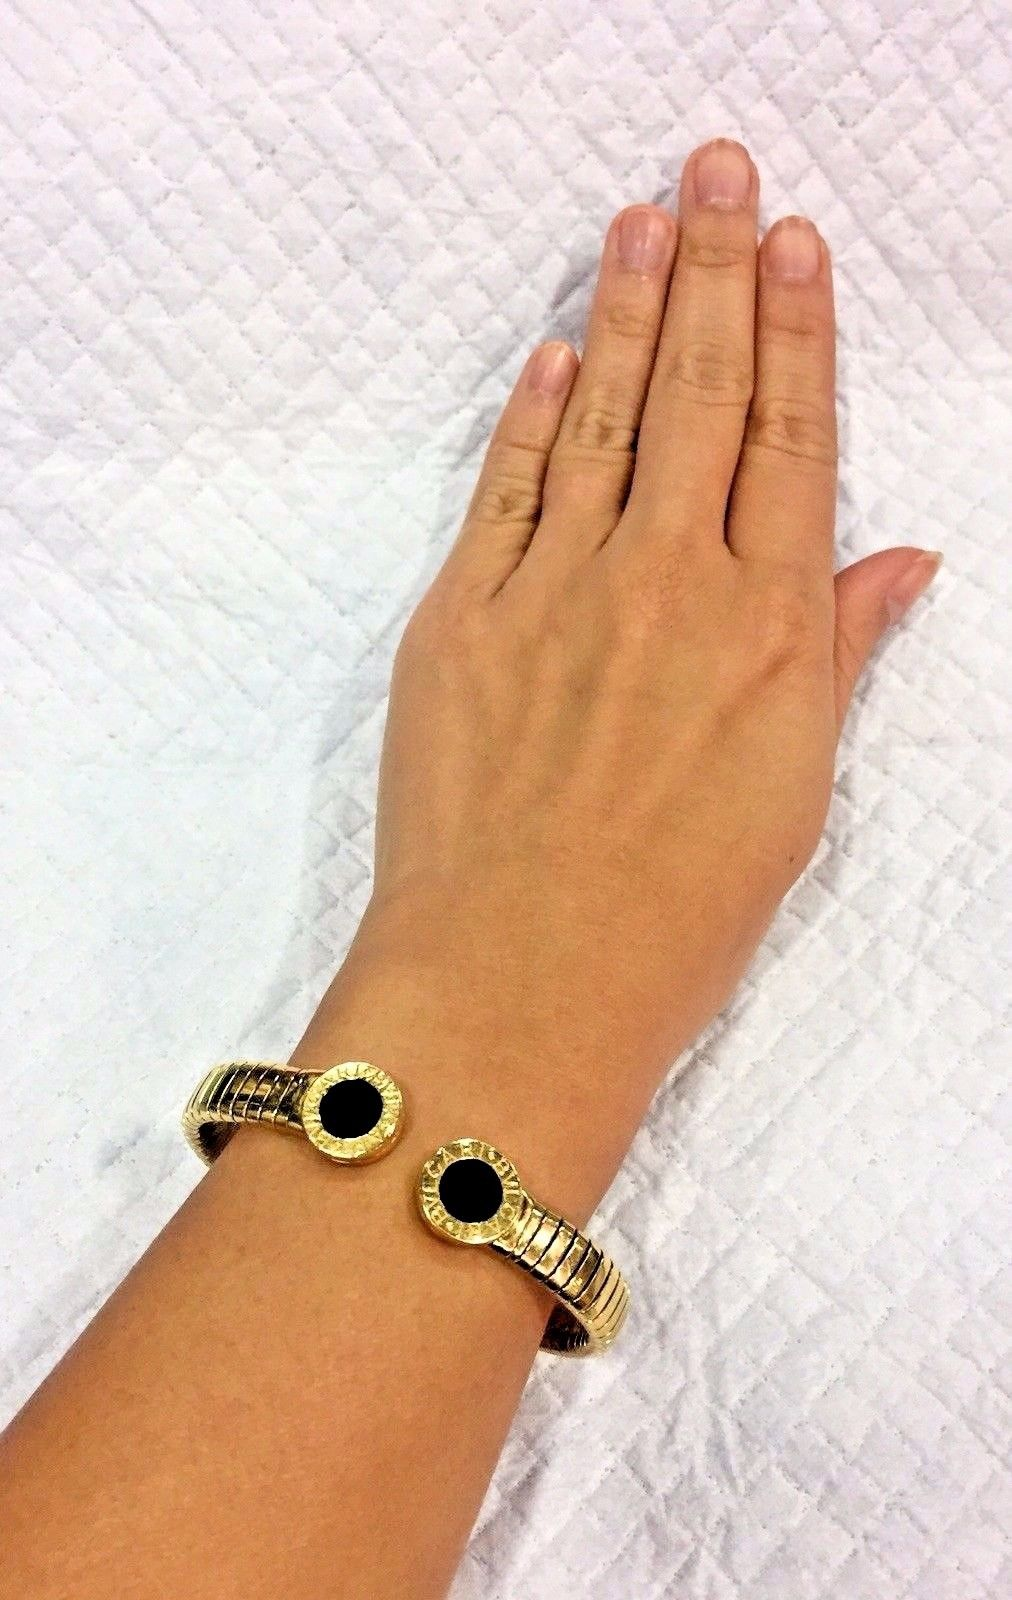 27f4fddc59f6c Estate Bvlgari Tubogas Bracelet in onyx and 18K yellow gold ...